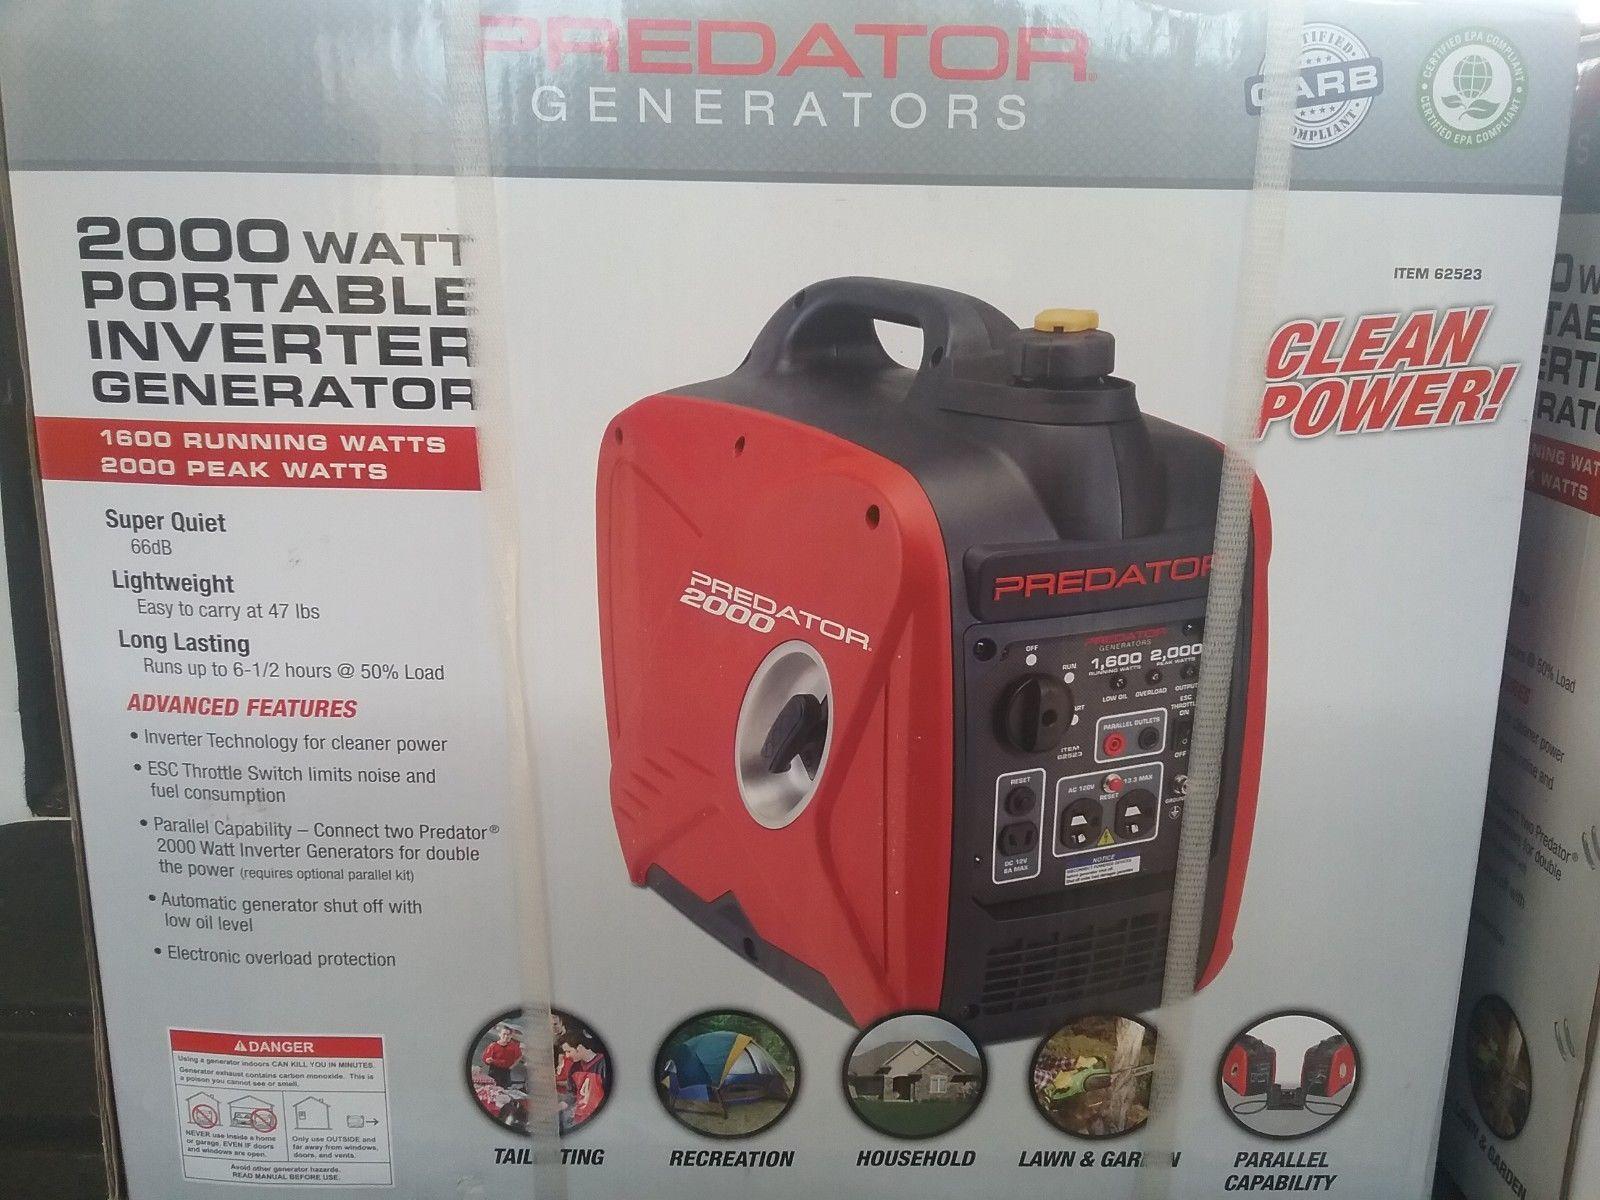 Predator 2000 Watt Inverter Generator Free Sh To Puerto Rico With Images Generators For Sale Inverter Generator Generation